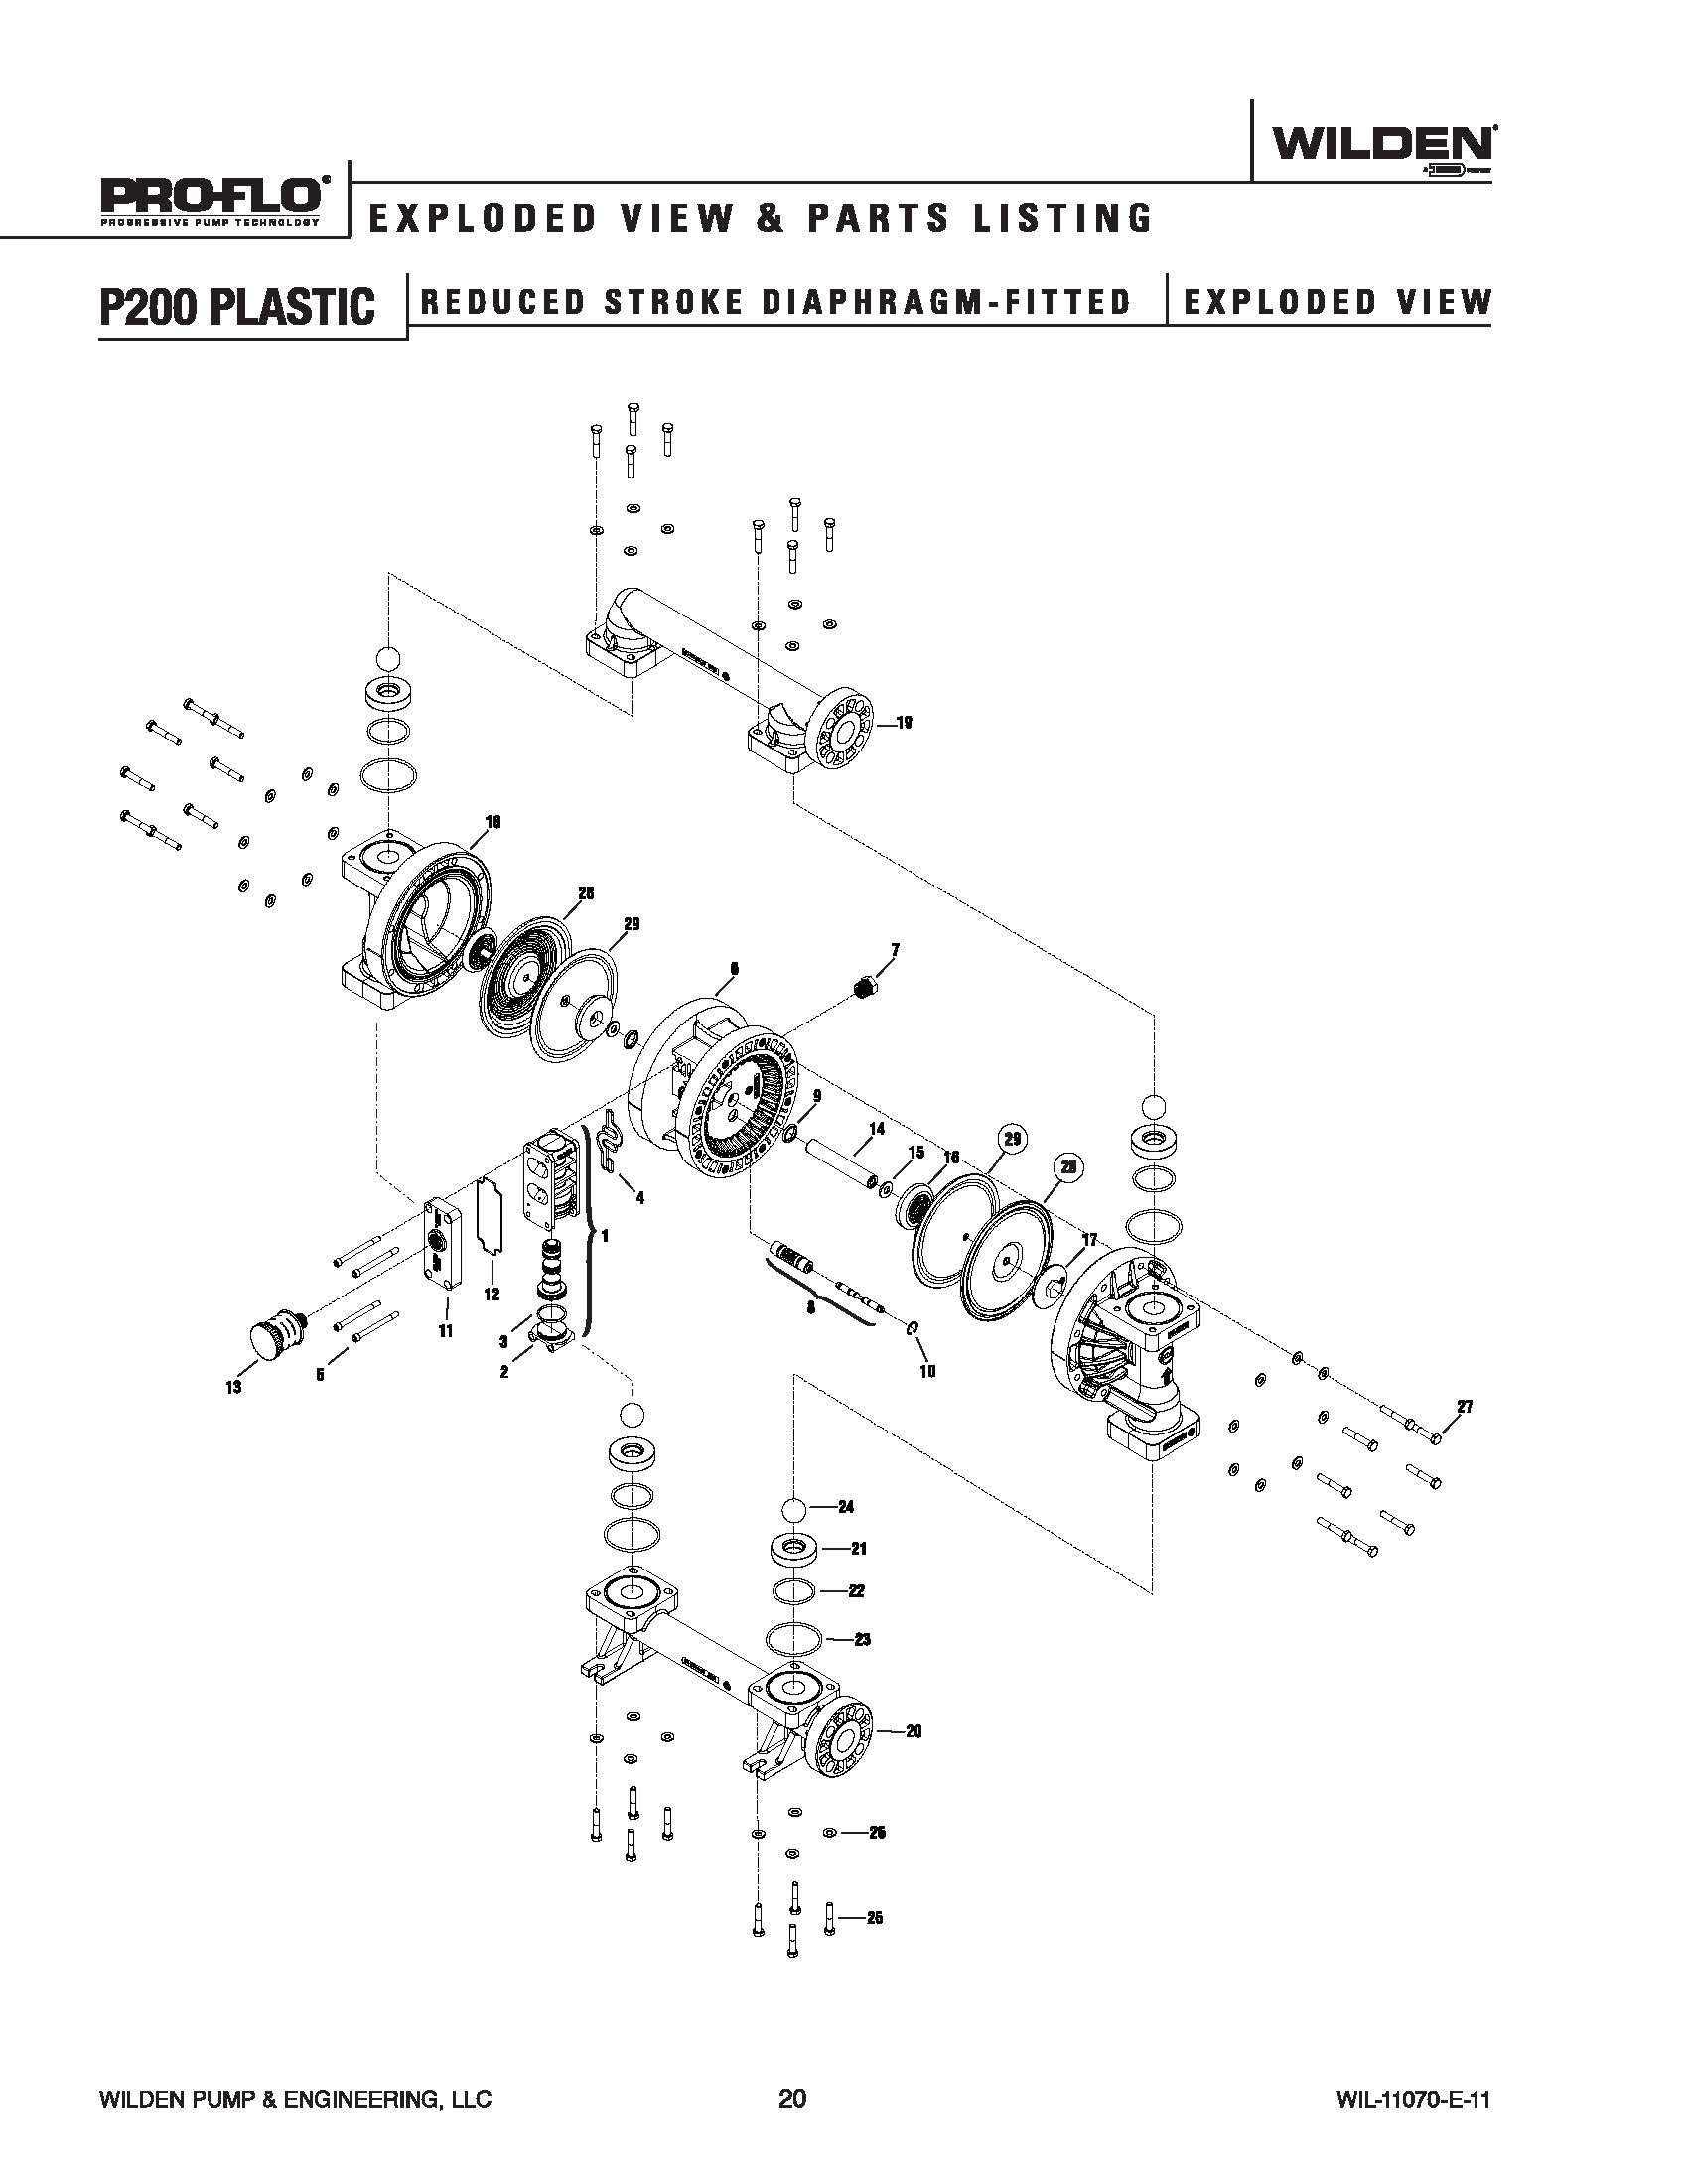 Wilden P200 Advanced Plastic Reduced Stroke Ptfe